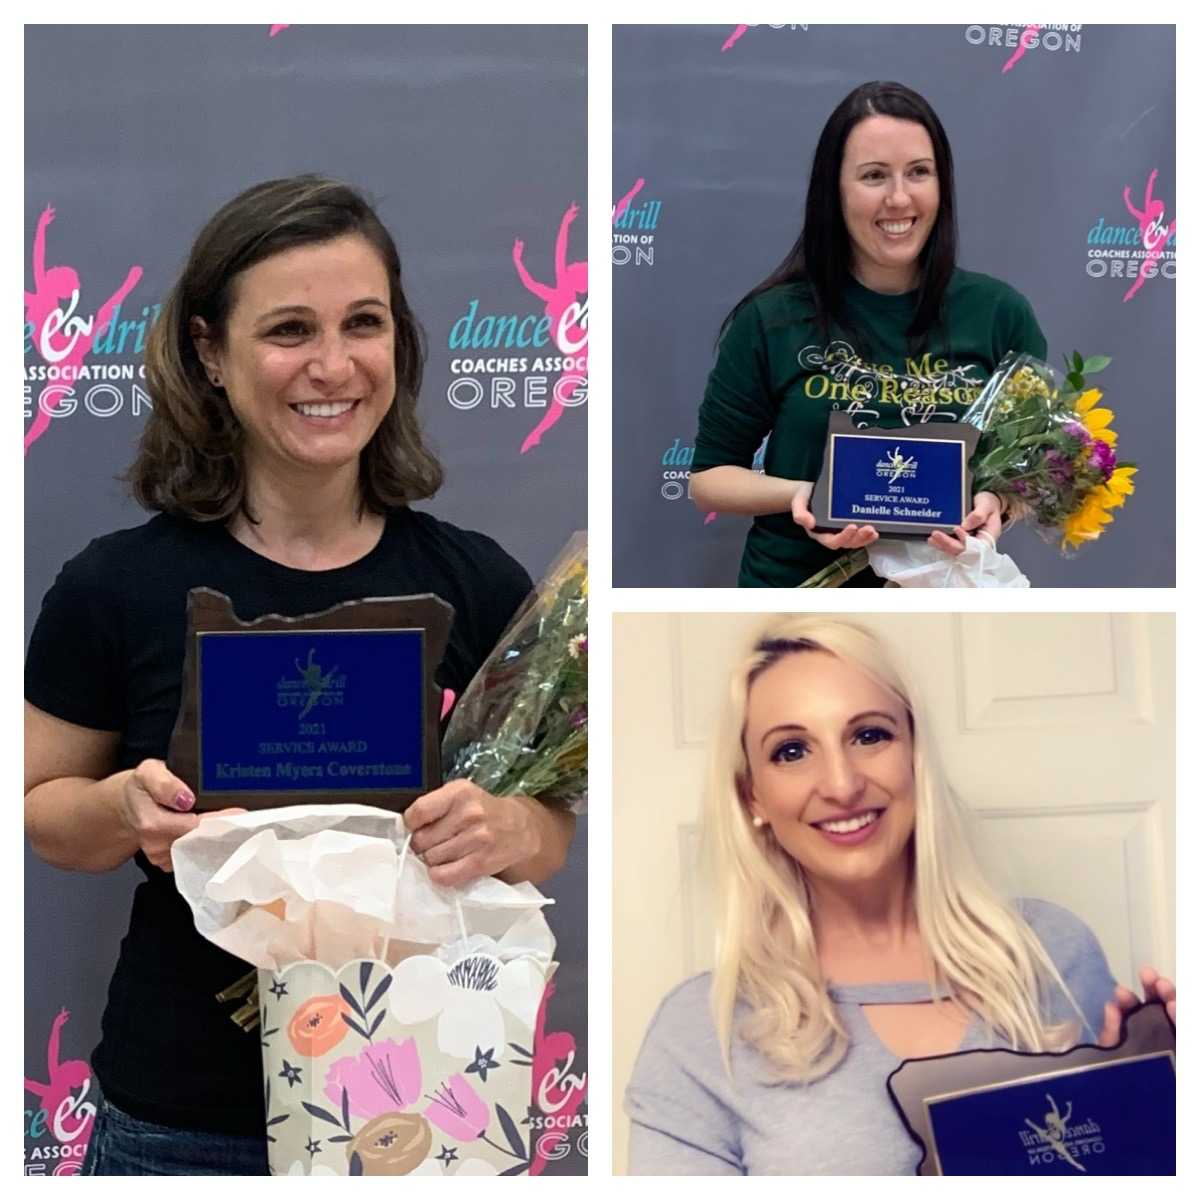 2021 DDCA Service Award Recipients Kristen Myers-Coverstone, Danielle Schneider and Kristin Alacron.